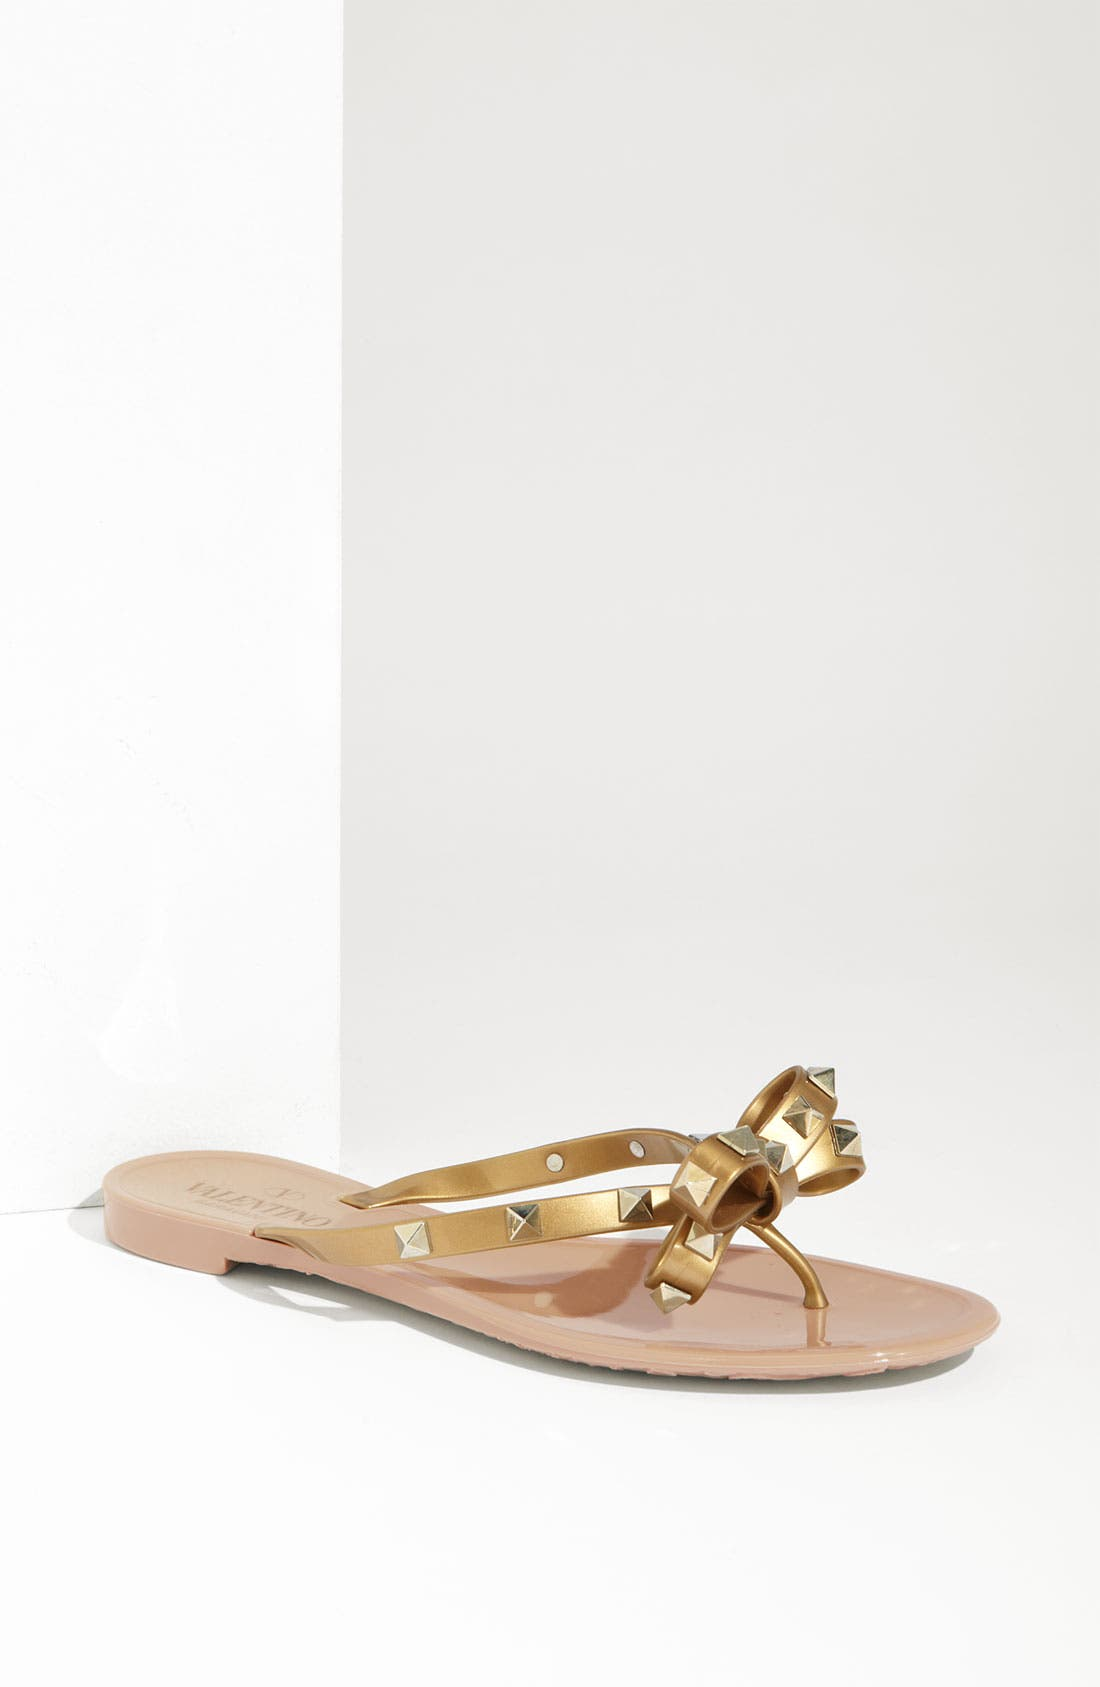 Main Image - VALENTINO GARAVANI 'Rockstud' Flip Flop (Women)